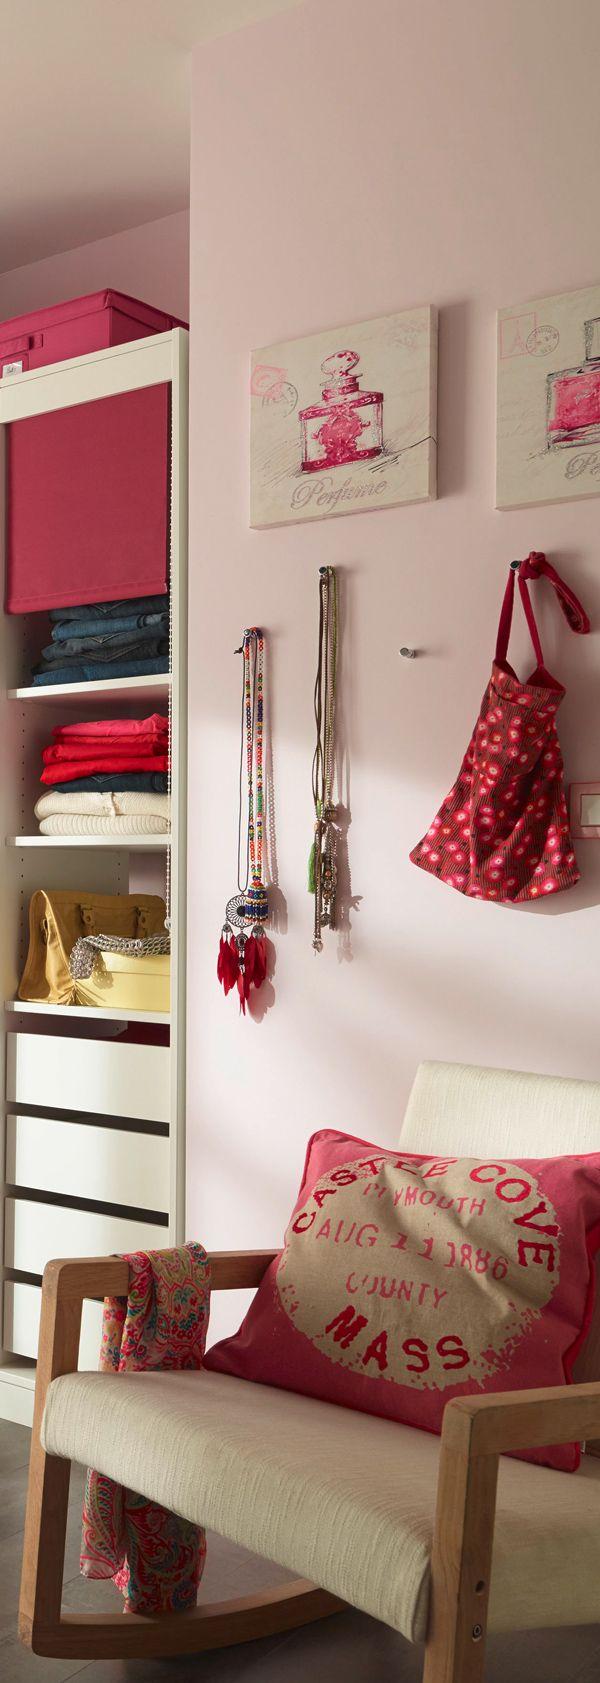 37 best Maison du monde images on Pinterest   Furniture, Baby room ...